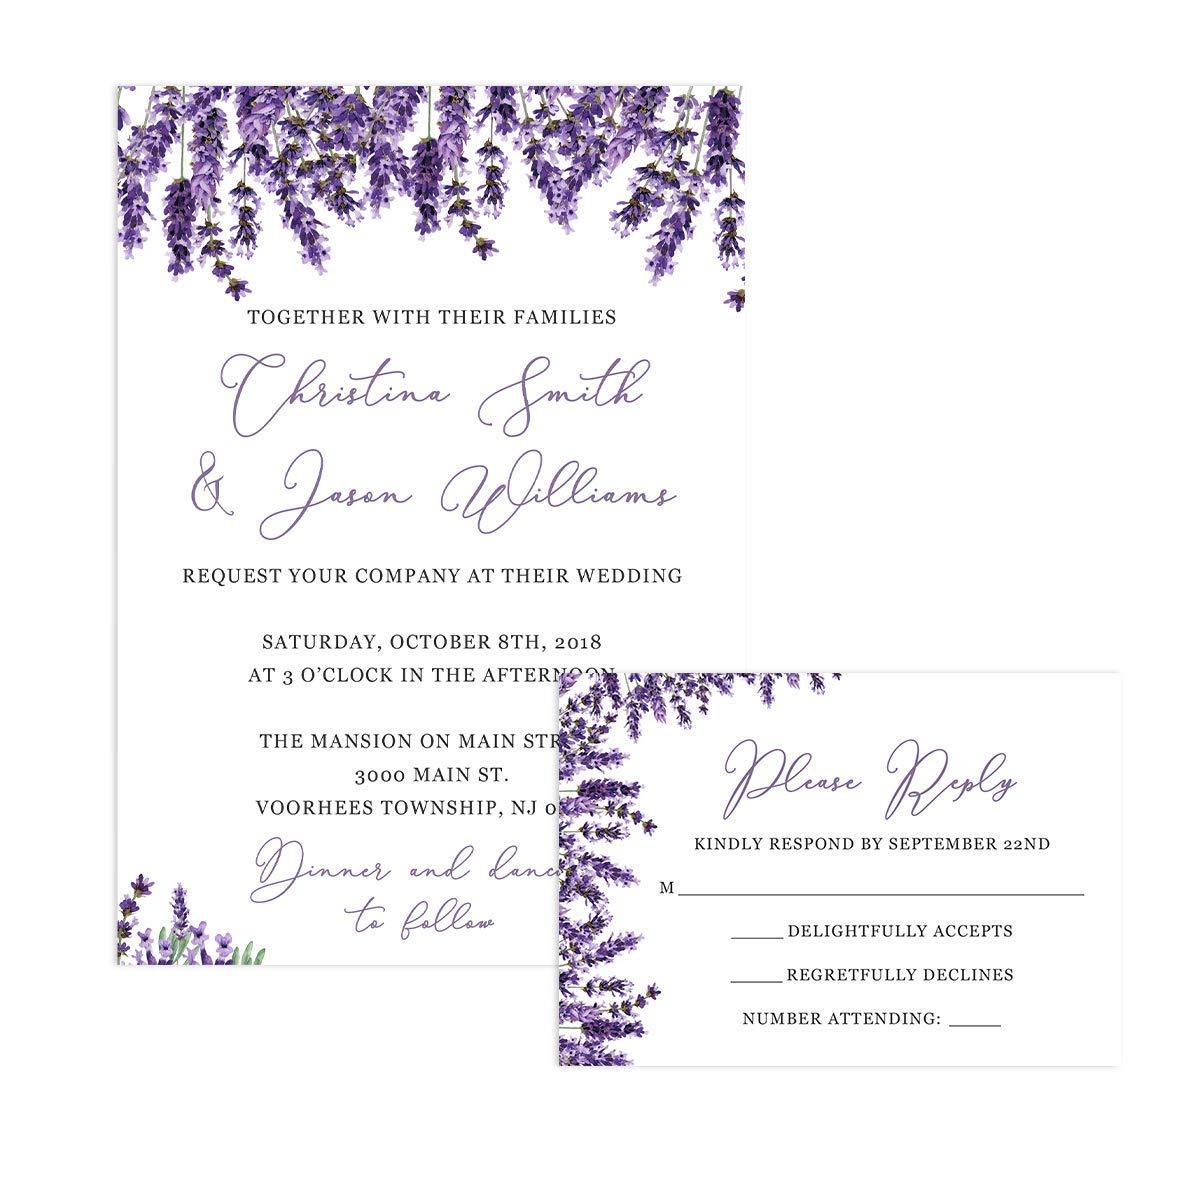 Lavender Wedding Invitations And Self Mailing Rsvp Cards Includes Envelopes For Set